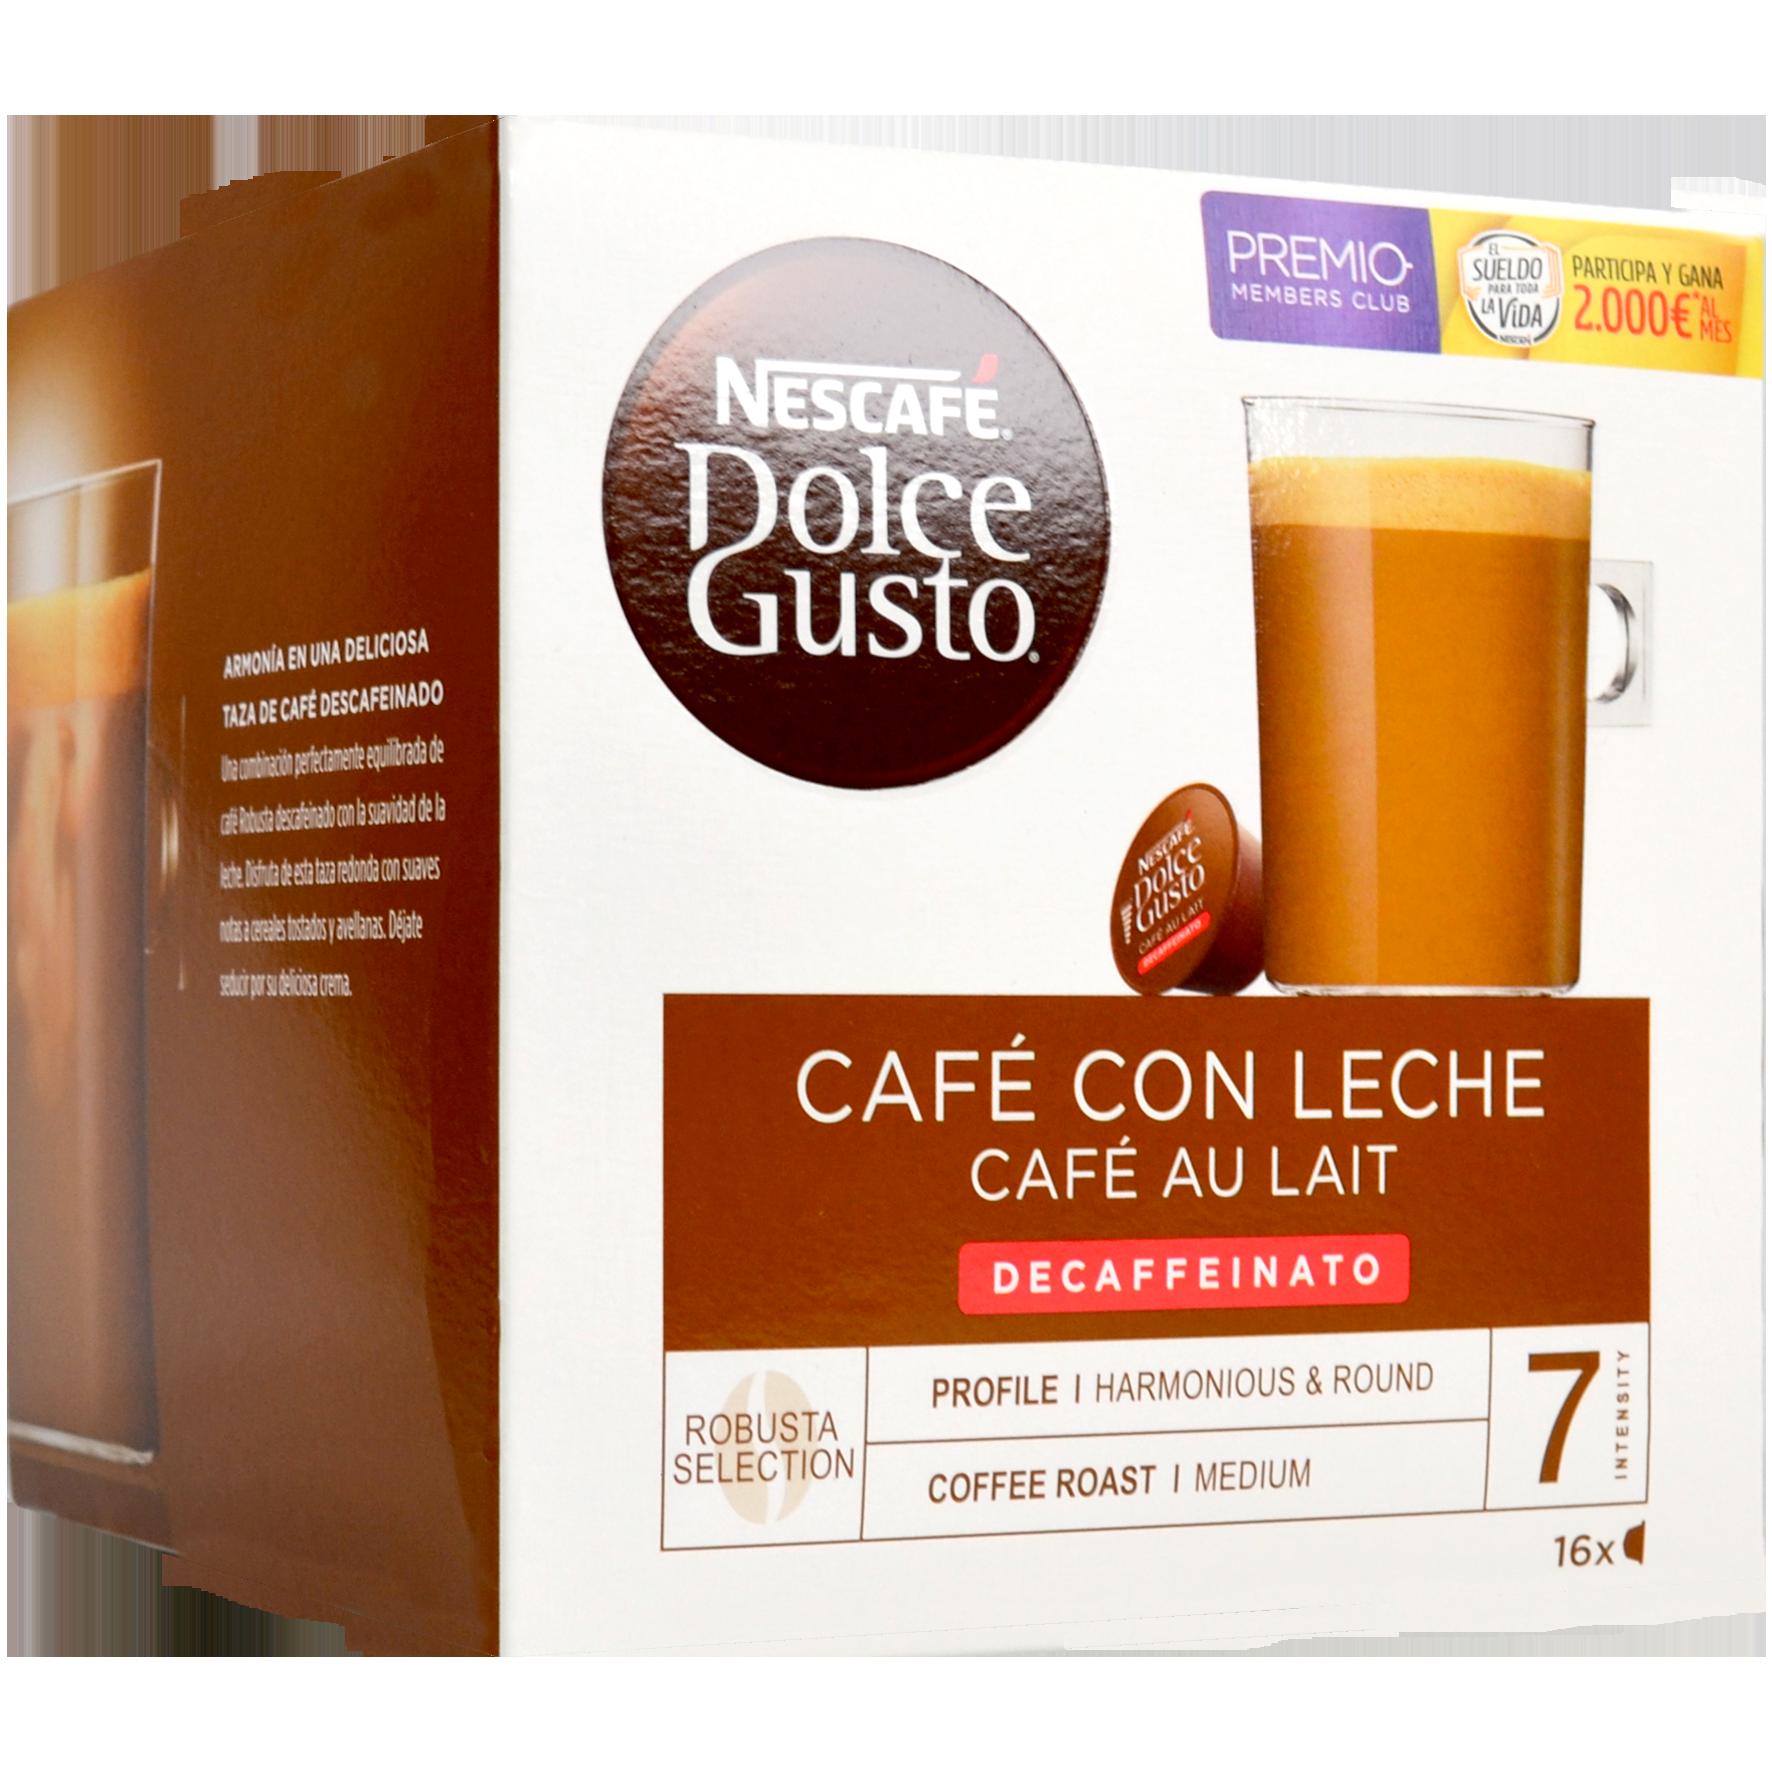 Càspula de cafè amb llet Nescafé Dolce Gusto descafeinat